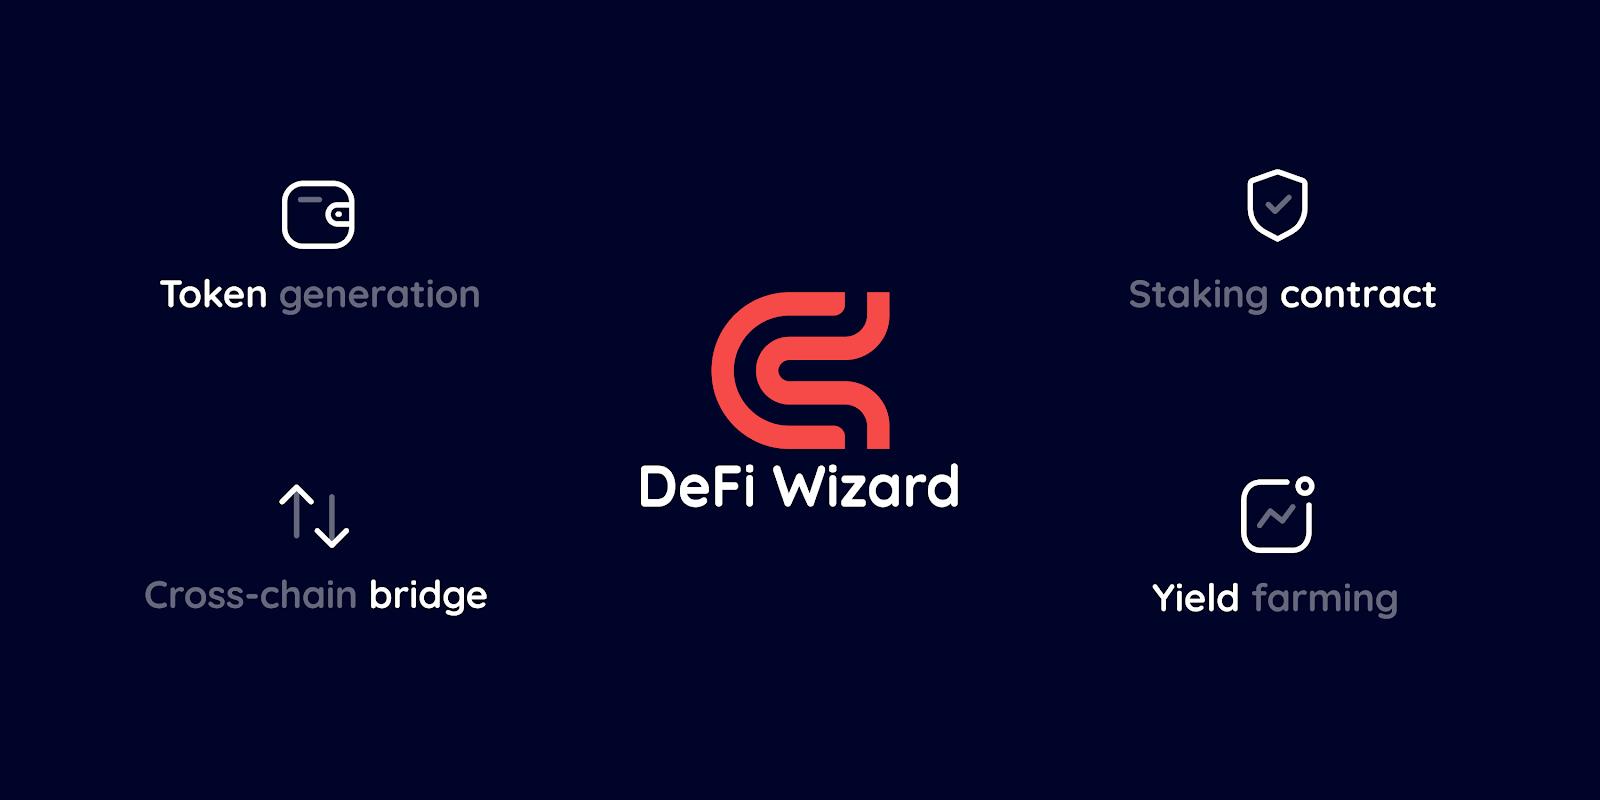 DeFi Wizard Raises $750k from Blockchain Investment Bigshots, to Simplify Multi-chain DeFi Legos